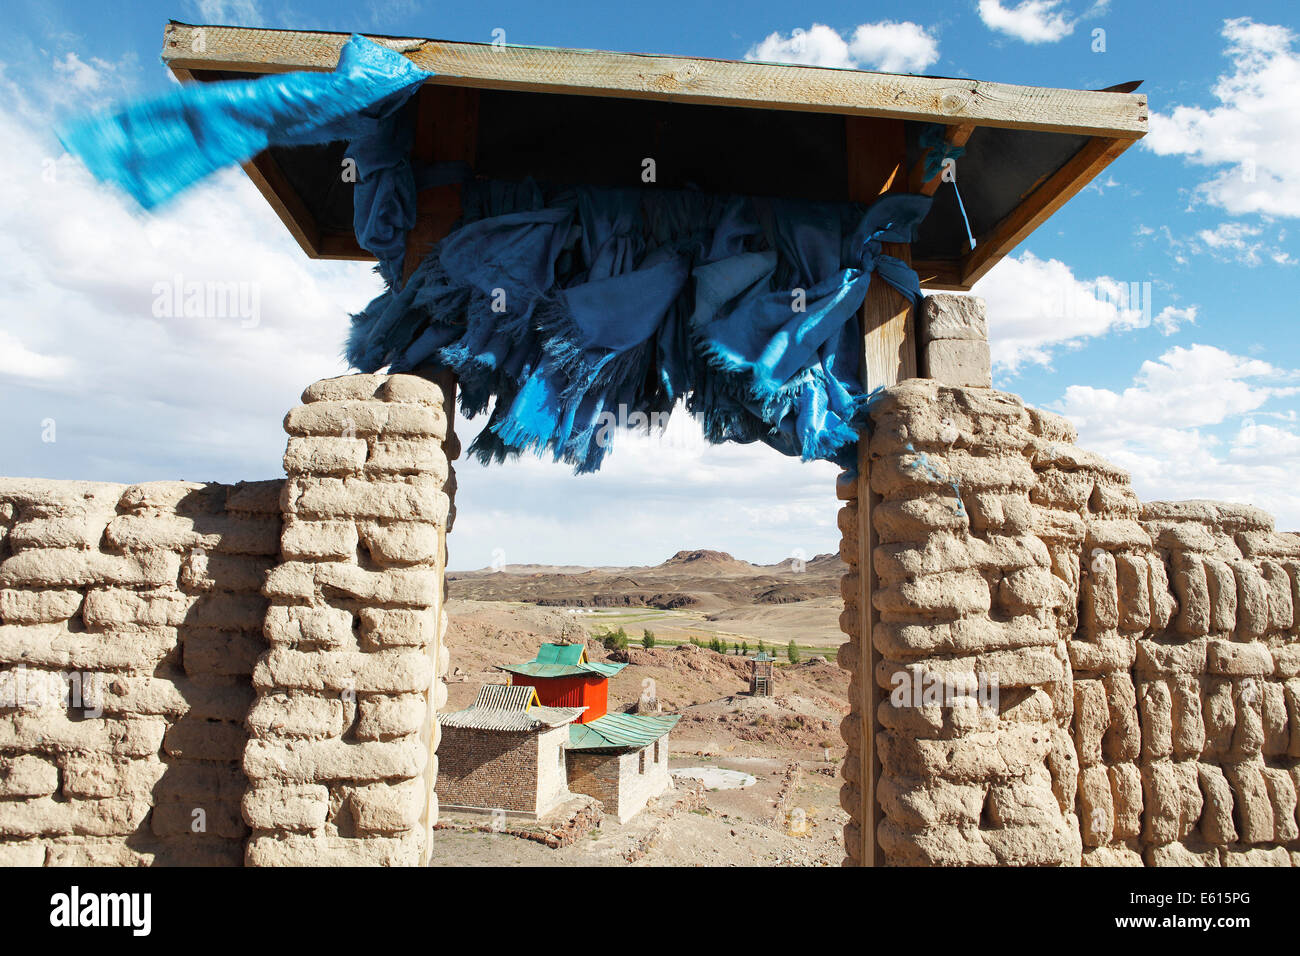 Ongi Khiid Monastery, door with prayer cloths, Ongi river valley, Central Desert, Dundgovi Province, Mongolia - Stock Image